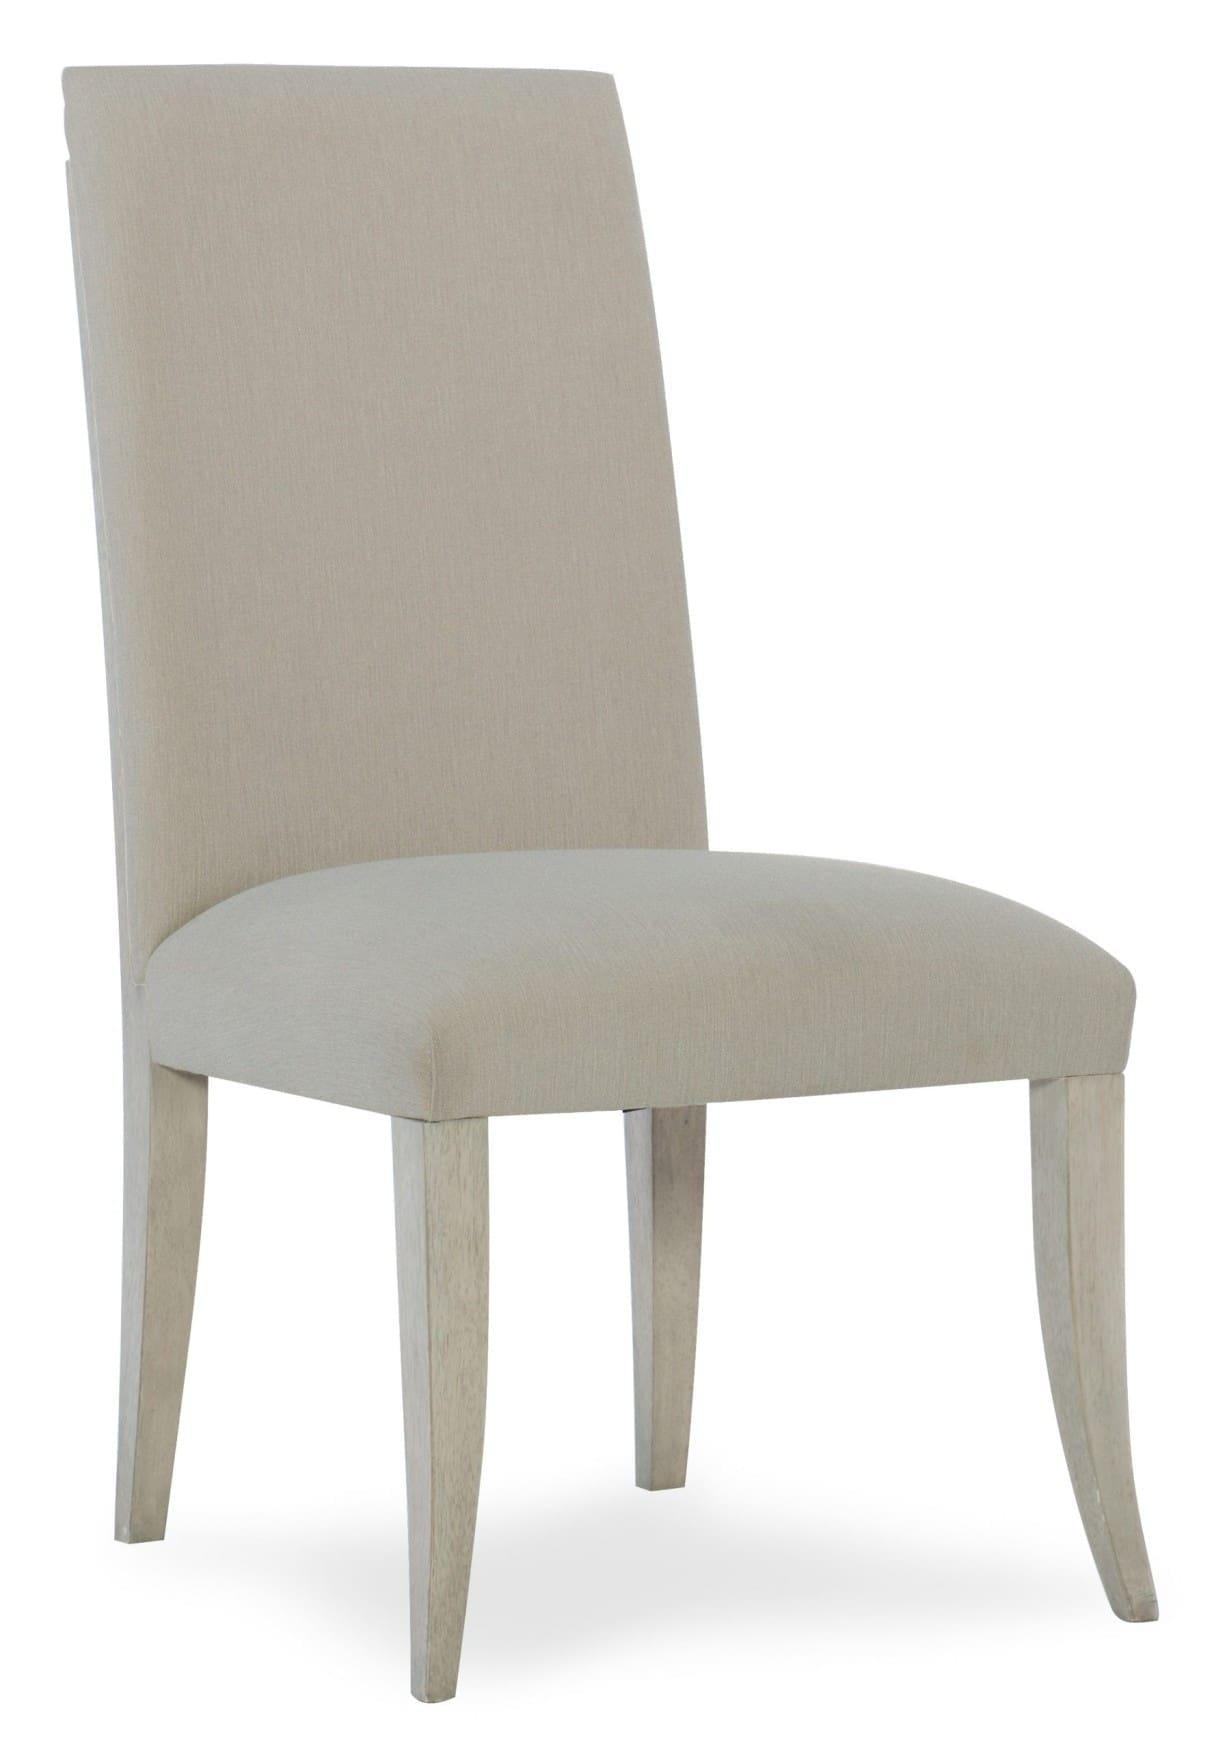 Elixir Upholstered Side Chair - 2 per carton/price ea